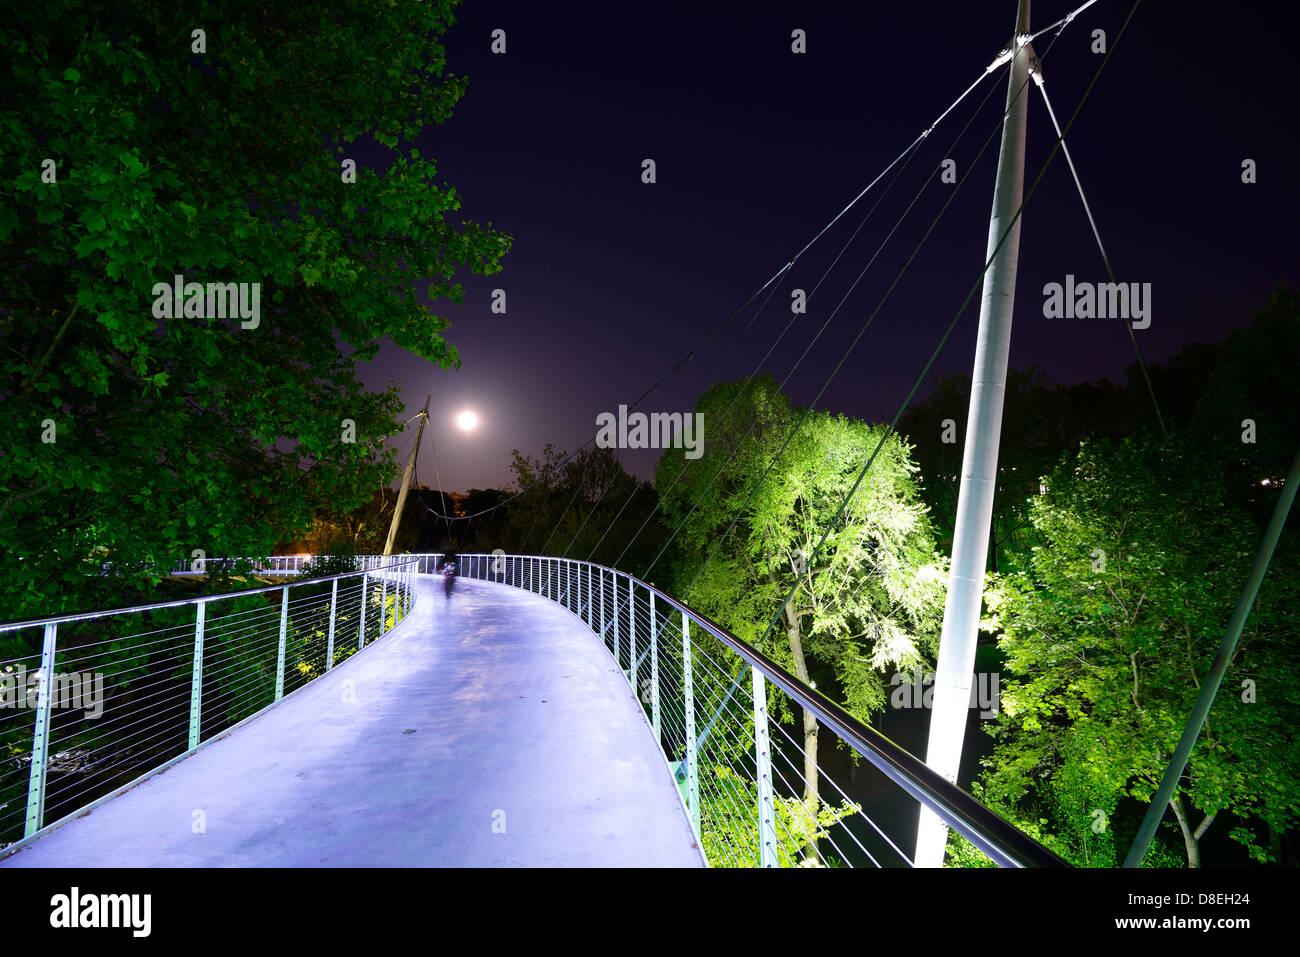 Liberty bridge in Greenville, South Carolina, USA - Stock Image